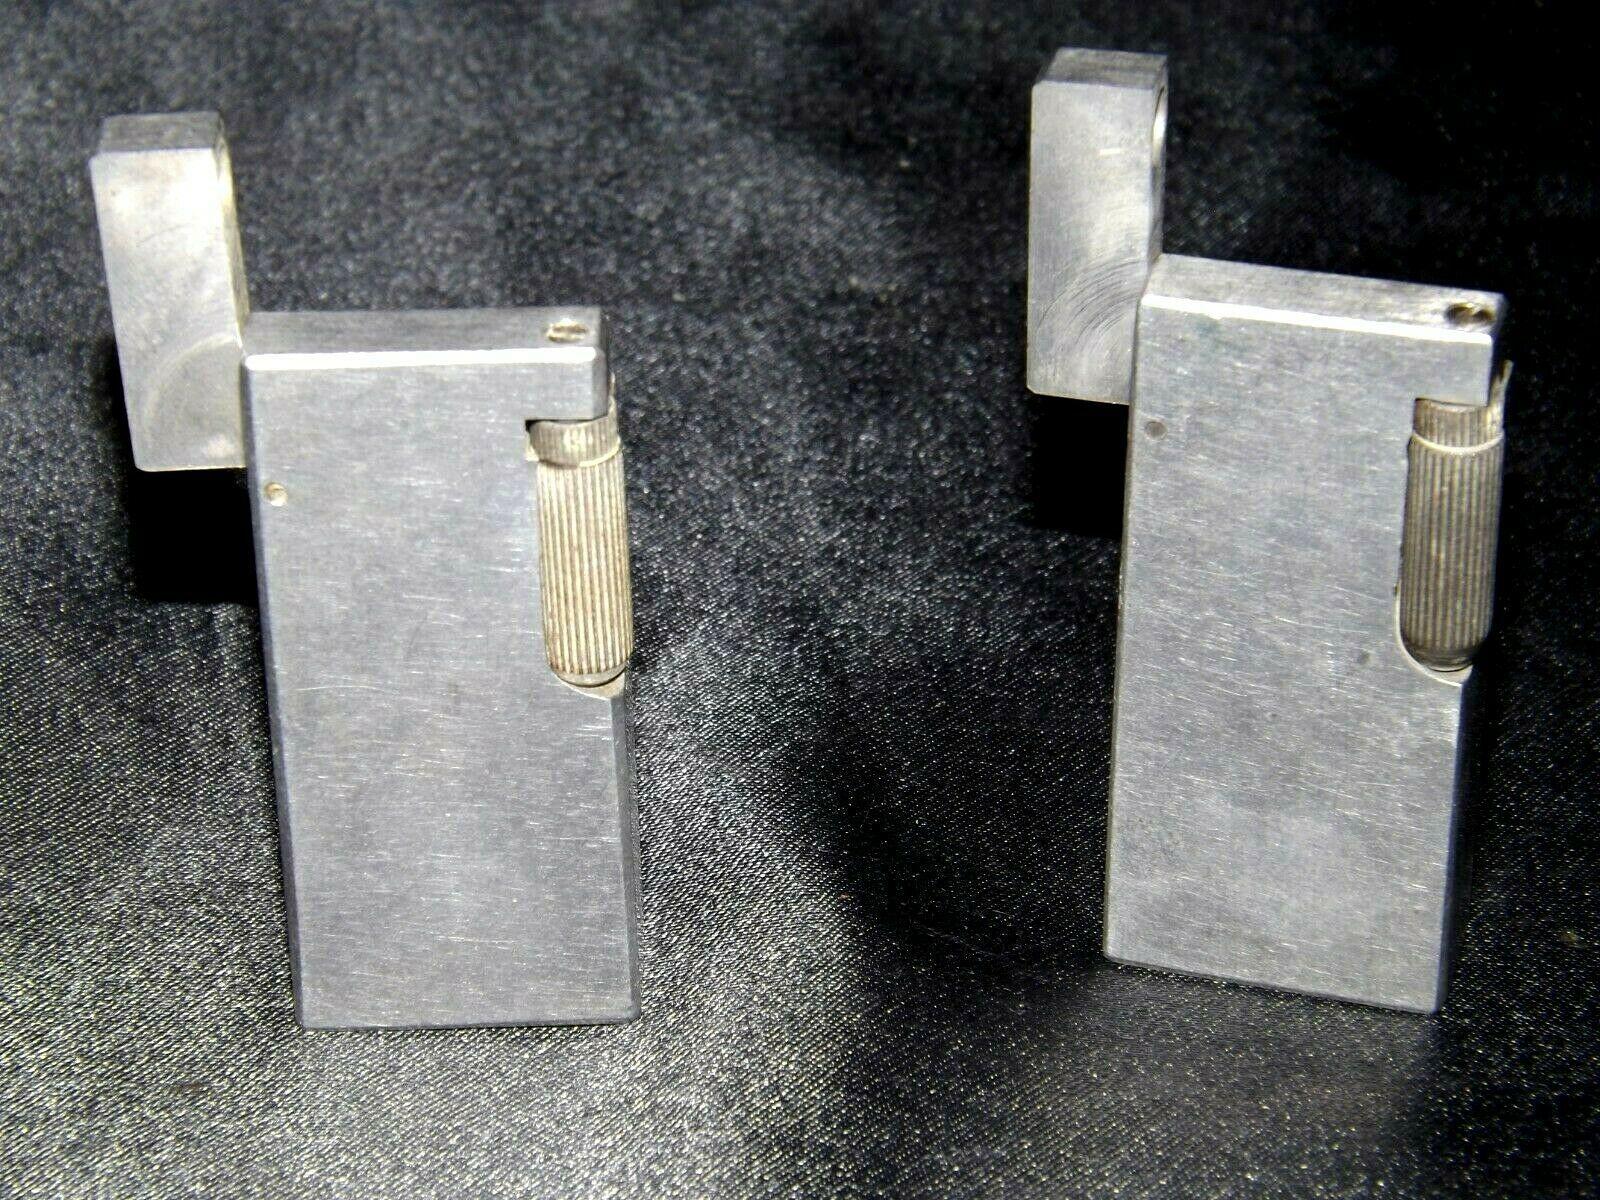 Flint Eaton Decatur Rectangle Lighters AA19-1676 Vintage Two